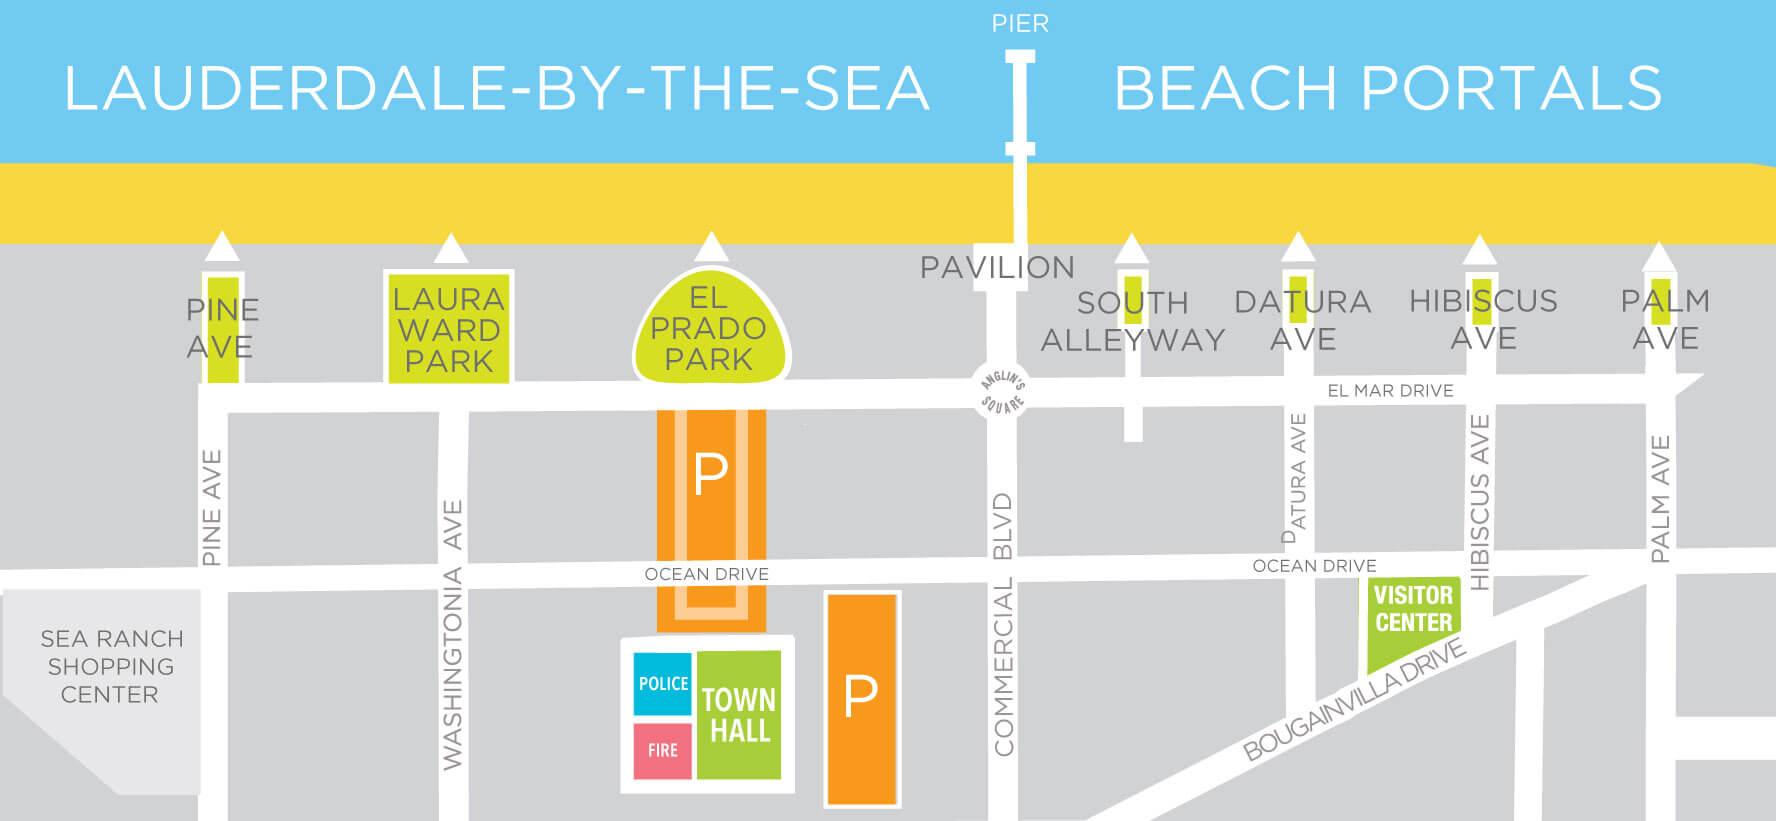 Beach Portals Map 2021